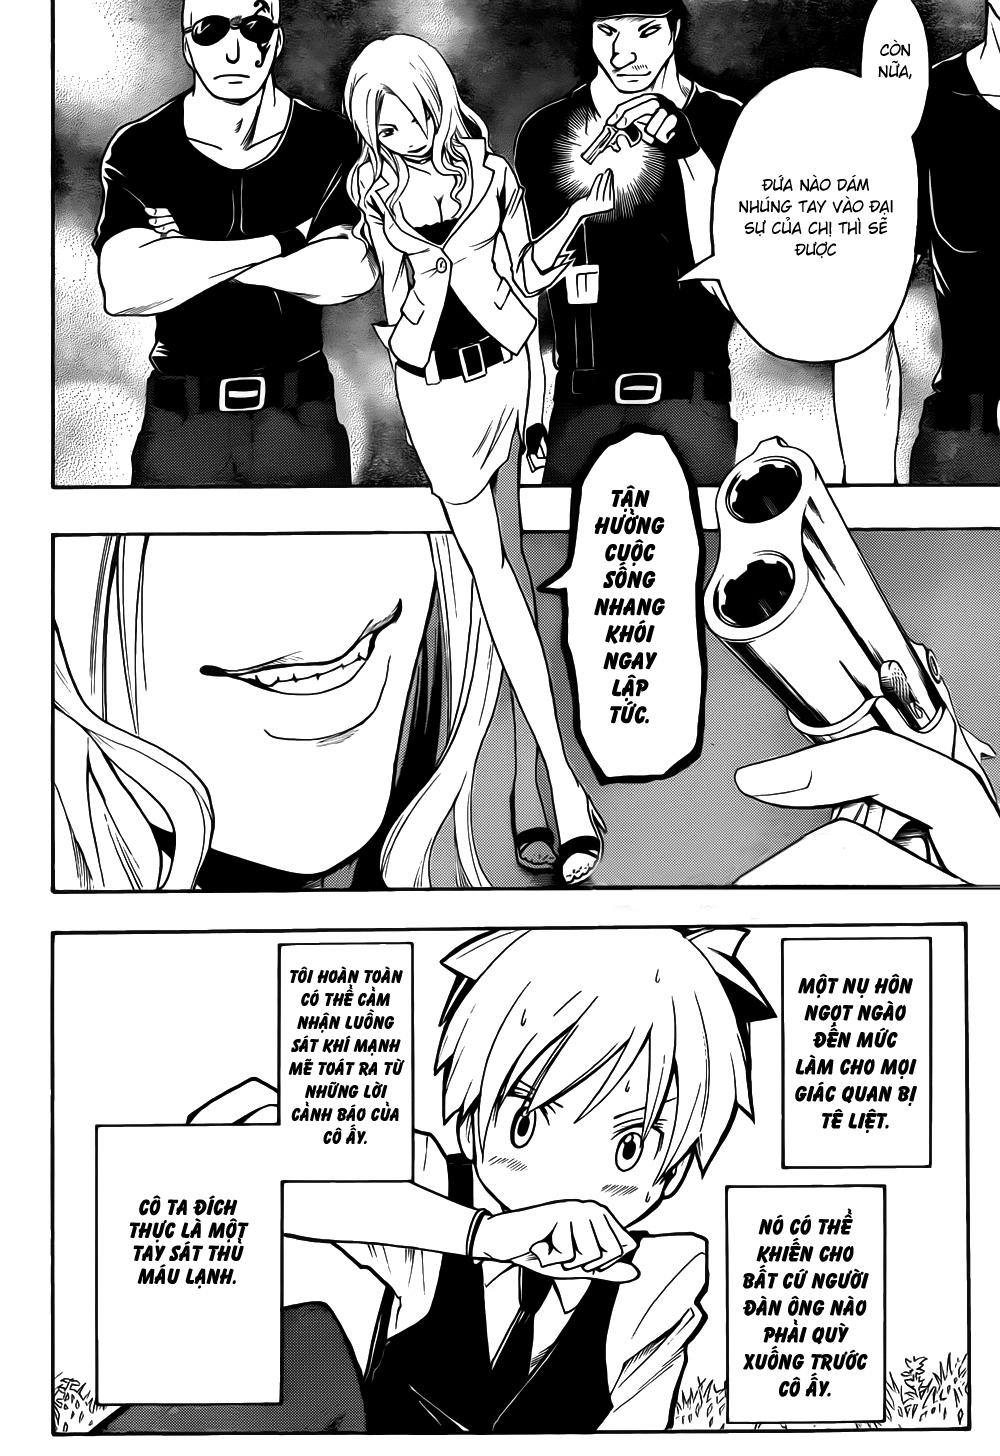 Ansatsu Kyoushitsu chap 8 trang 19